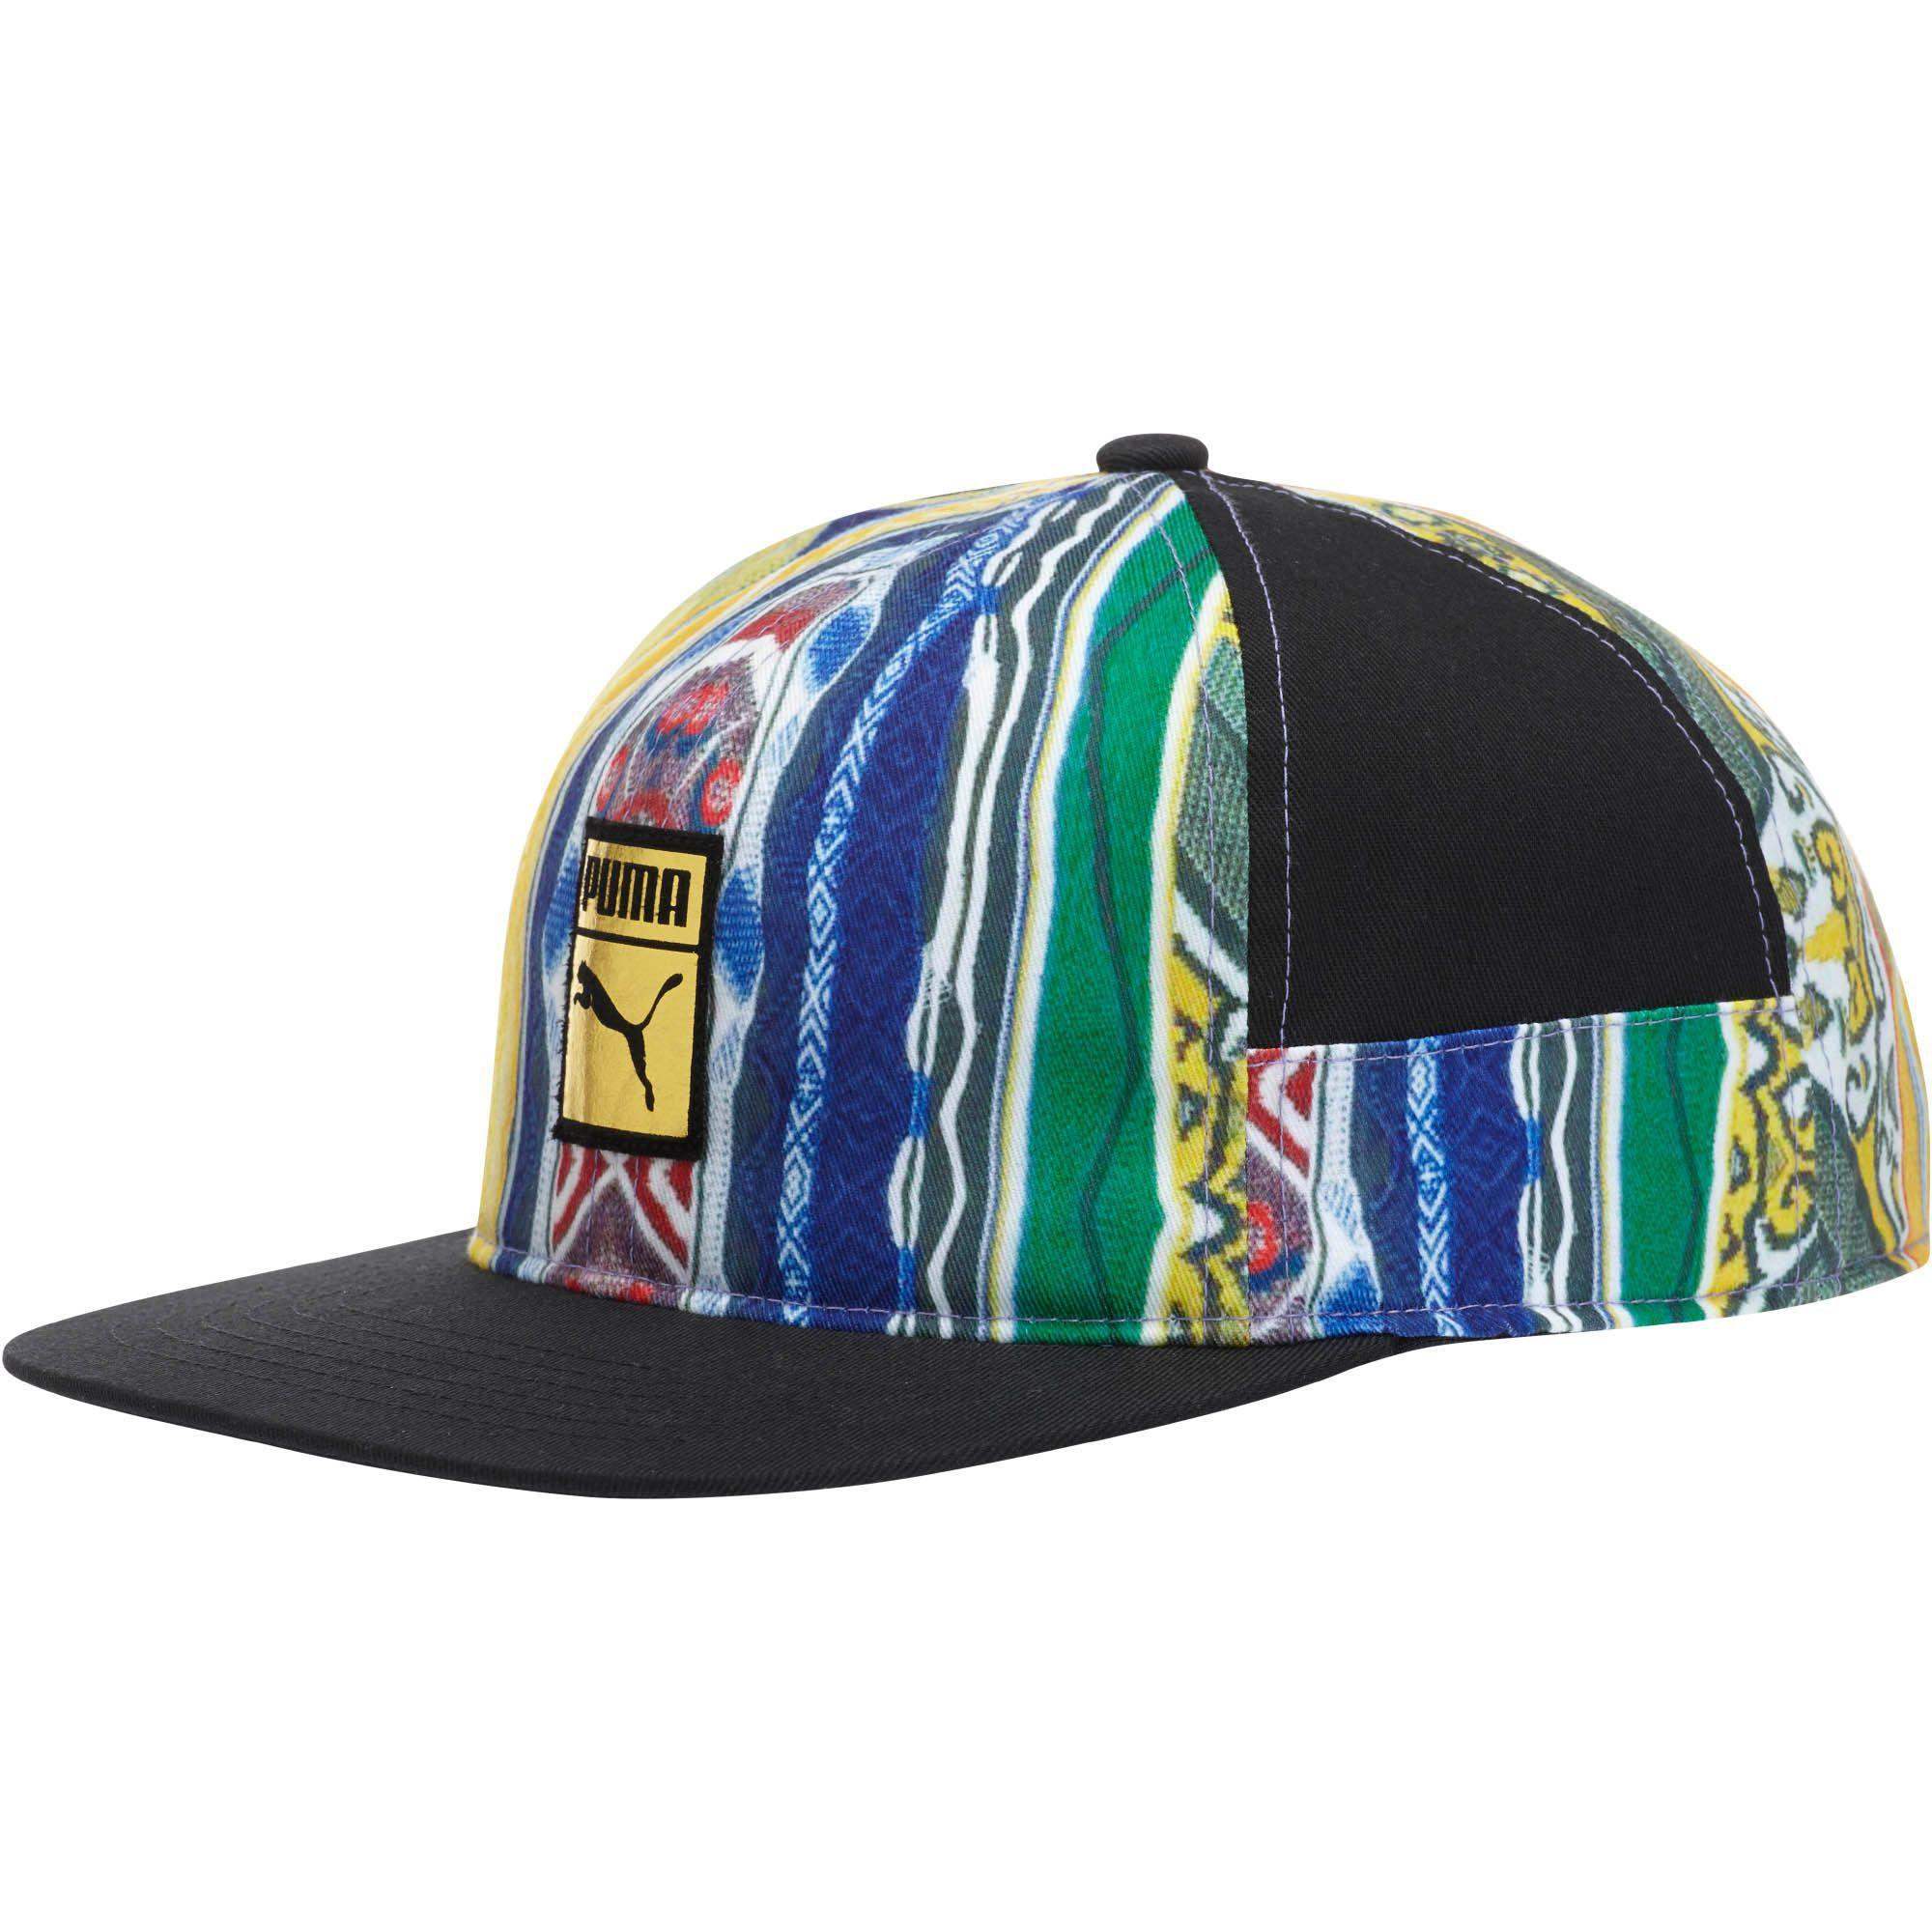 3a080f10269 Lyst - PUMA Coogi Colorblock Hat in Black for Men